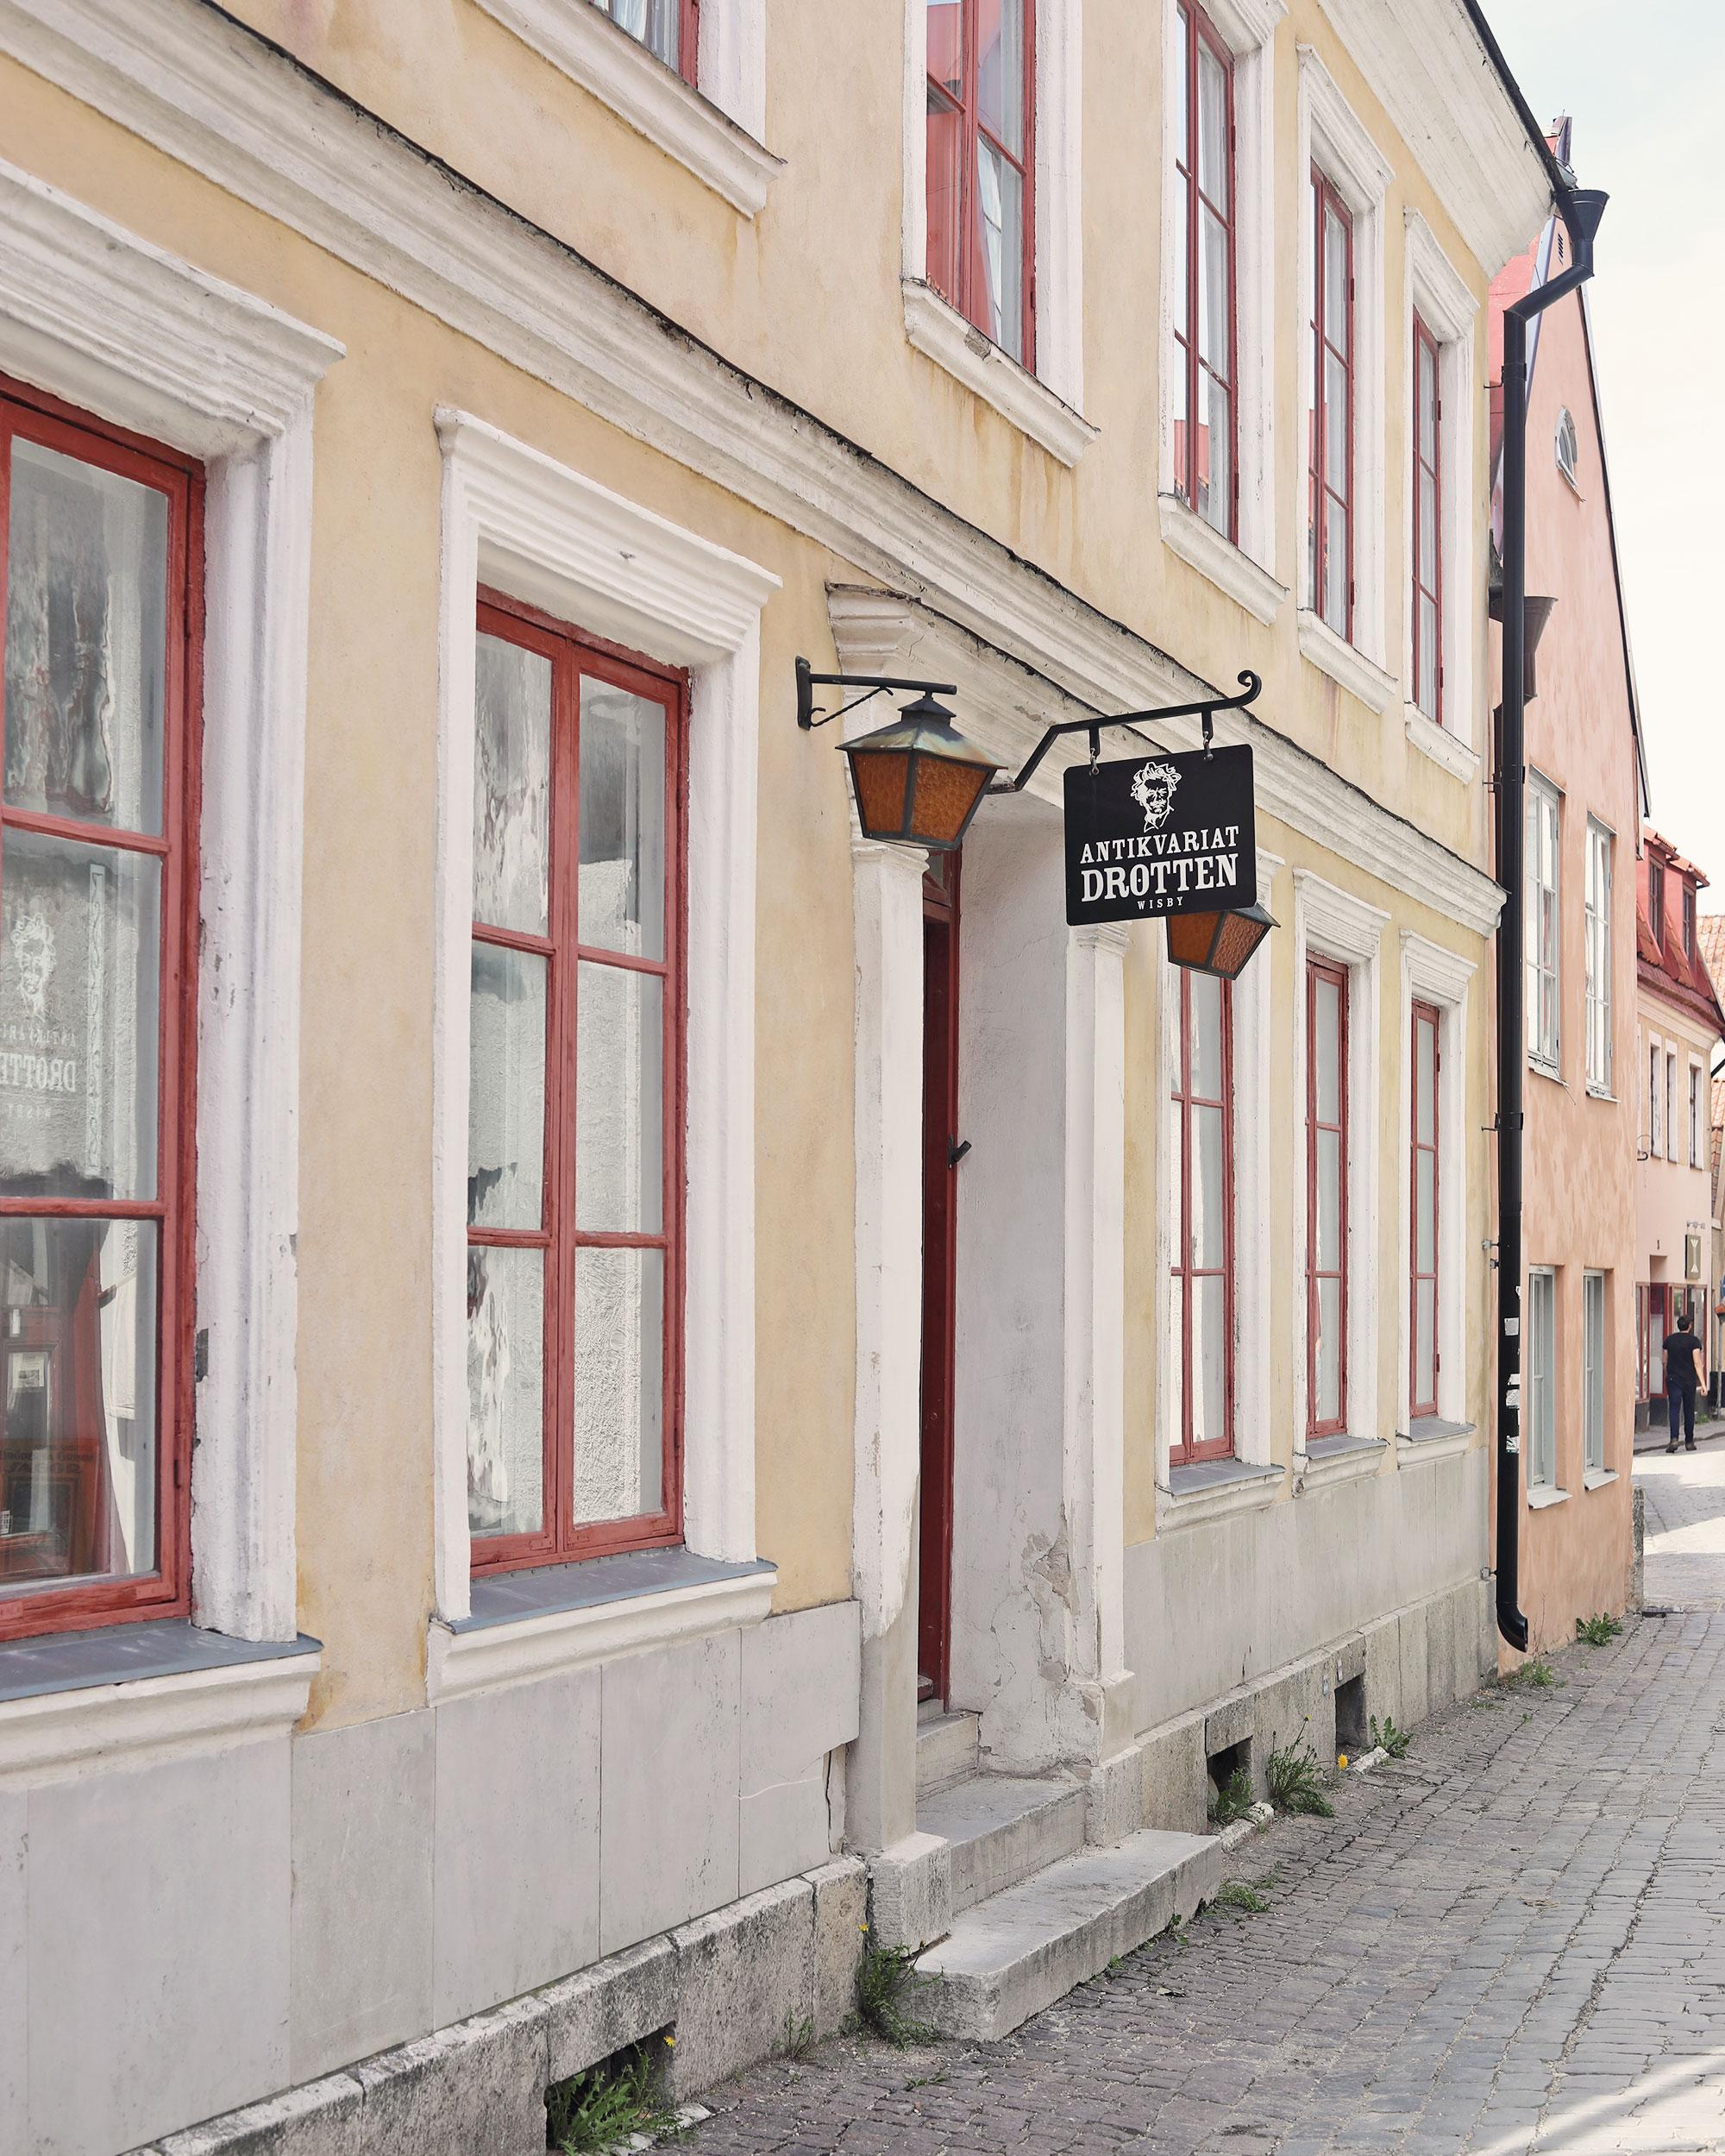 visby gotland hus antikvariat drotten